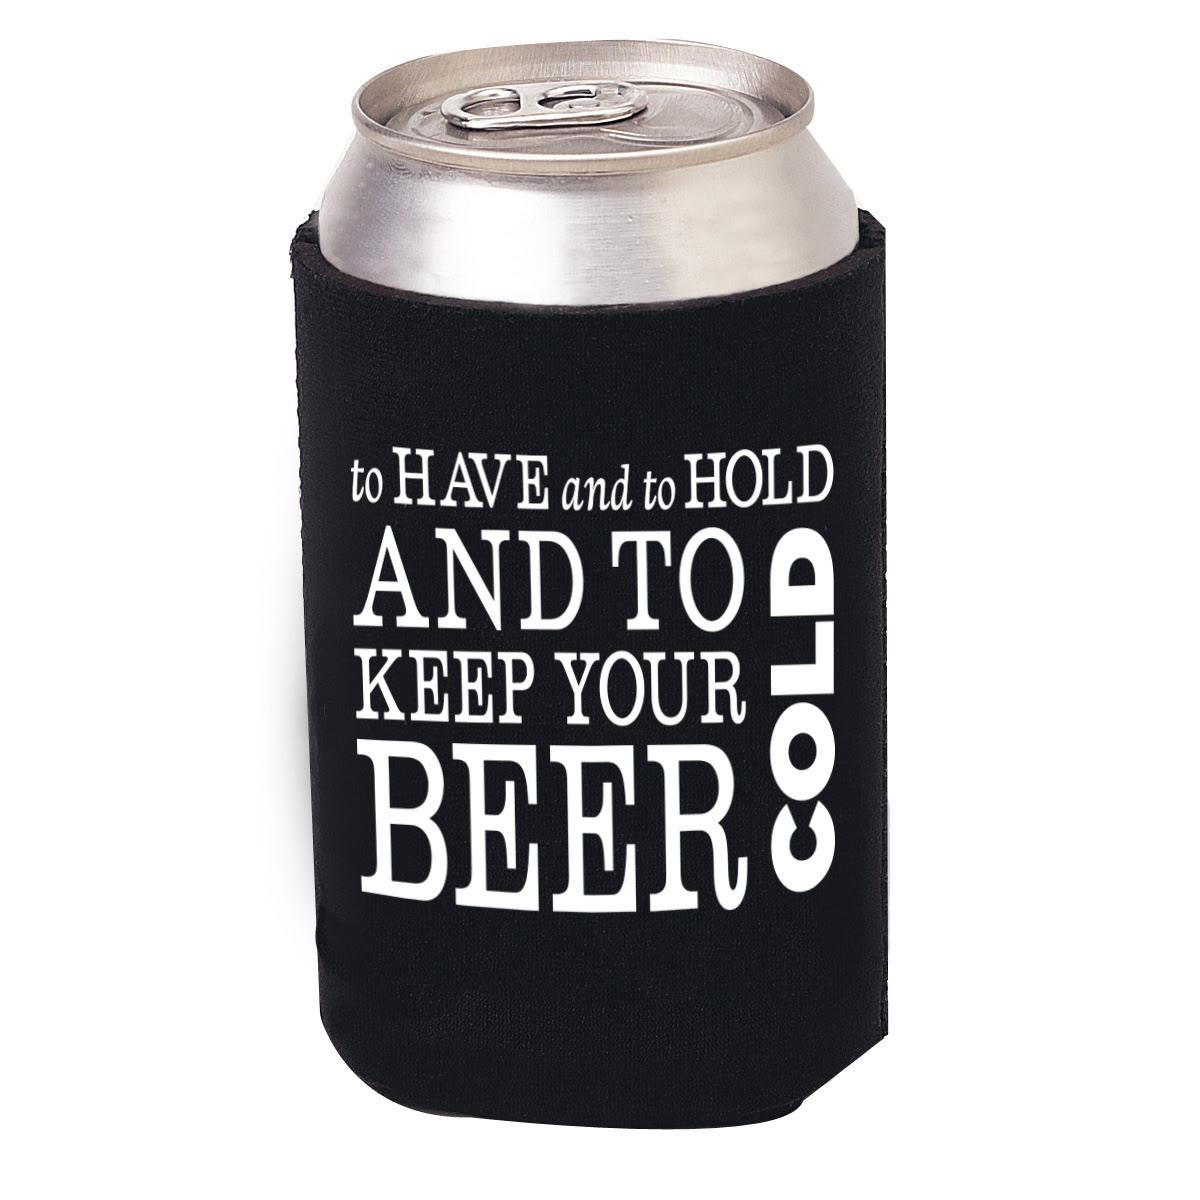 45 Drinking Slogans For Your Koozie Blue Soda Promo Blog